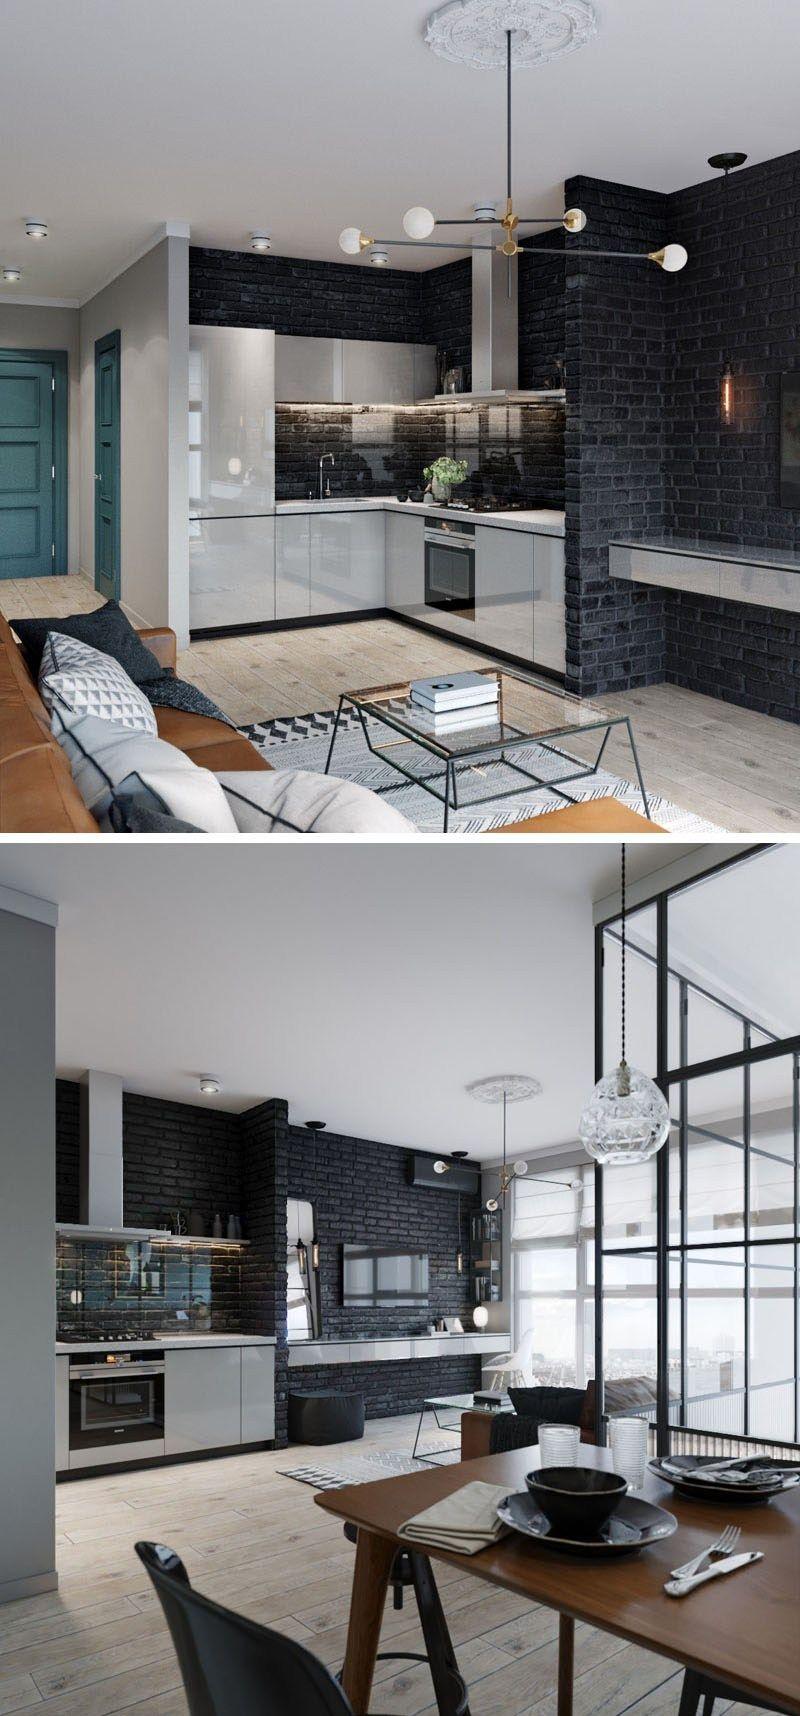 Mur Bleu Canard Et Style Loft Blog Deco Appartement Moderne Mur De Briques Noir Mur Bleu Canard